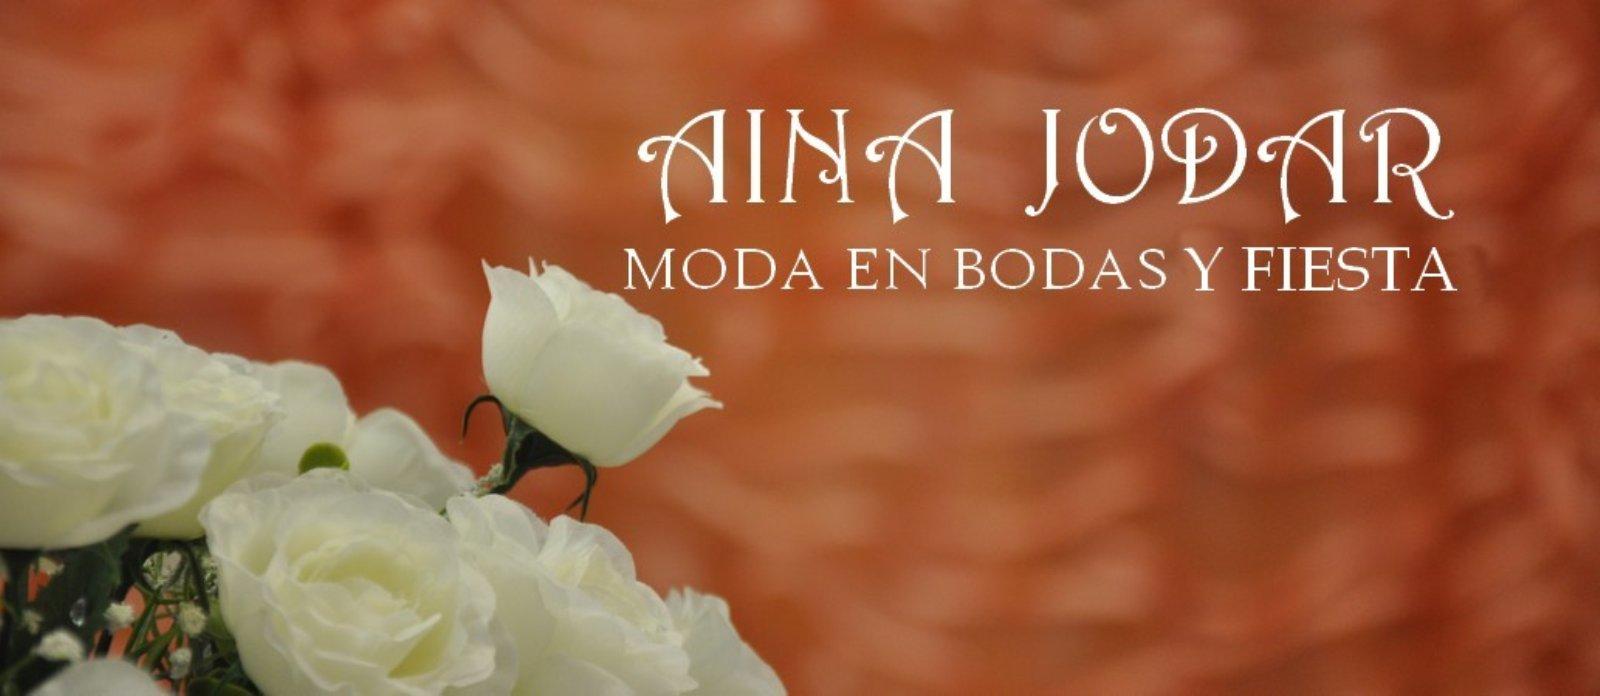 Aina Jodar  Trajes Bodas Gitanas, trajes de boda